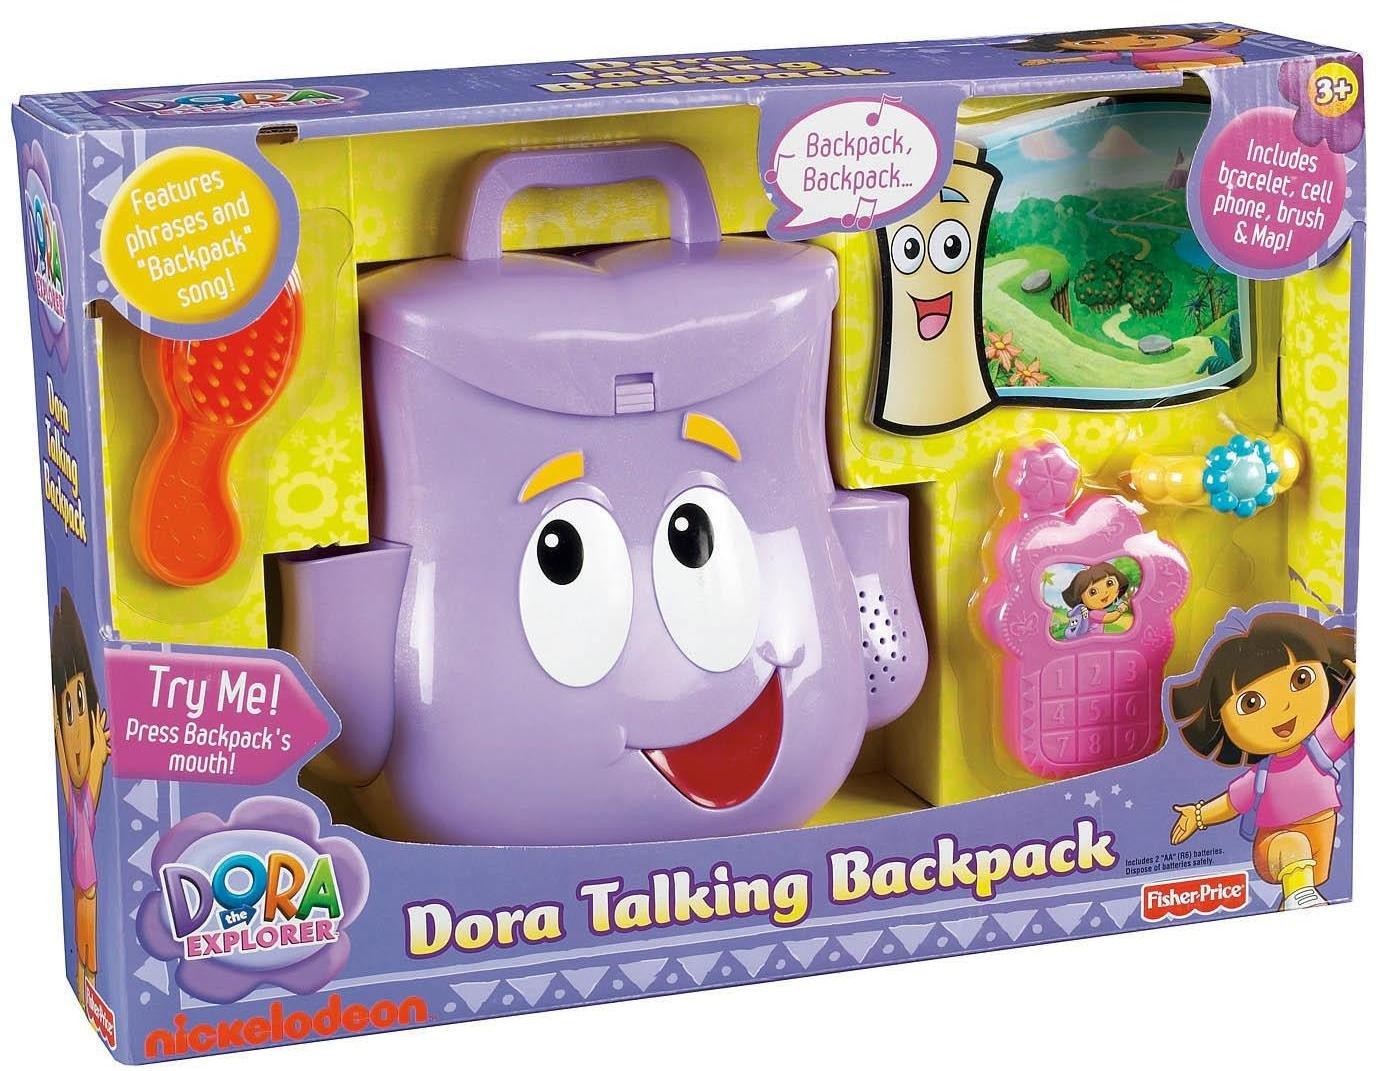 Dora The Explorer Backpack Contents Amazon com Fisher-Price Dora